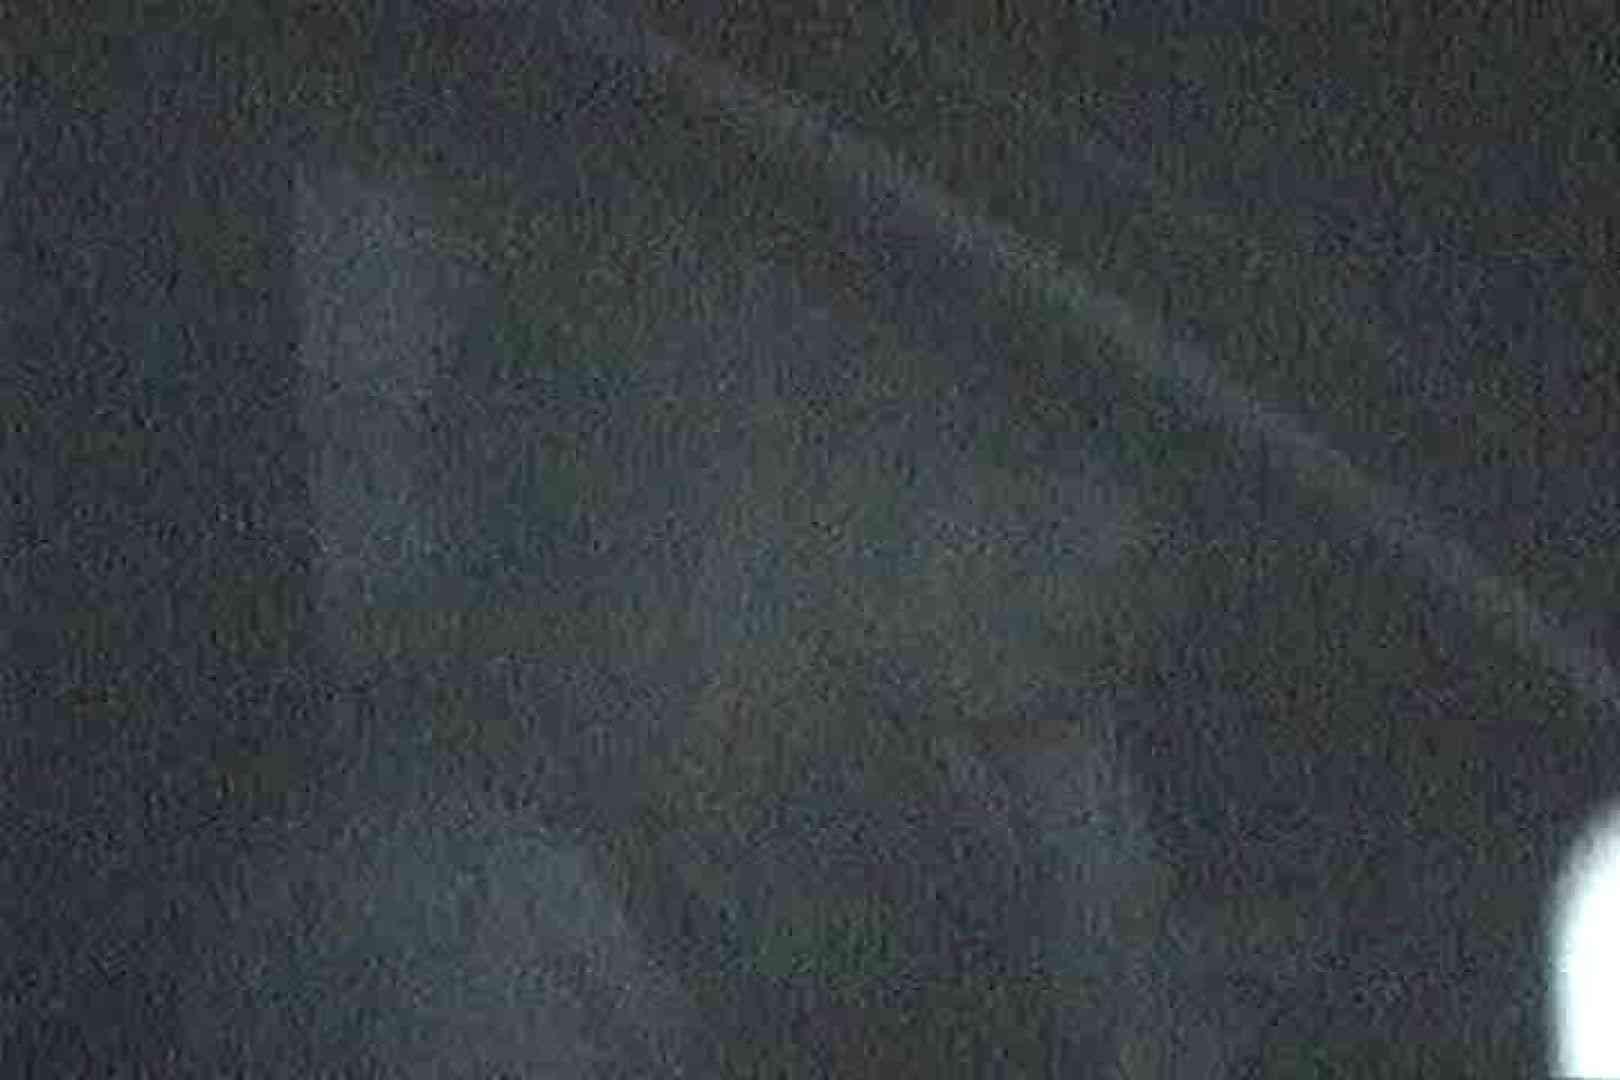 充血監督の深夜の運動会Vol.161 美女OL  106連発 24